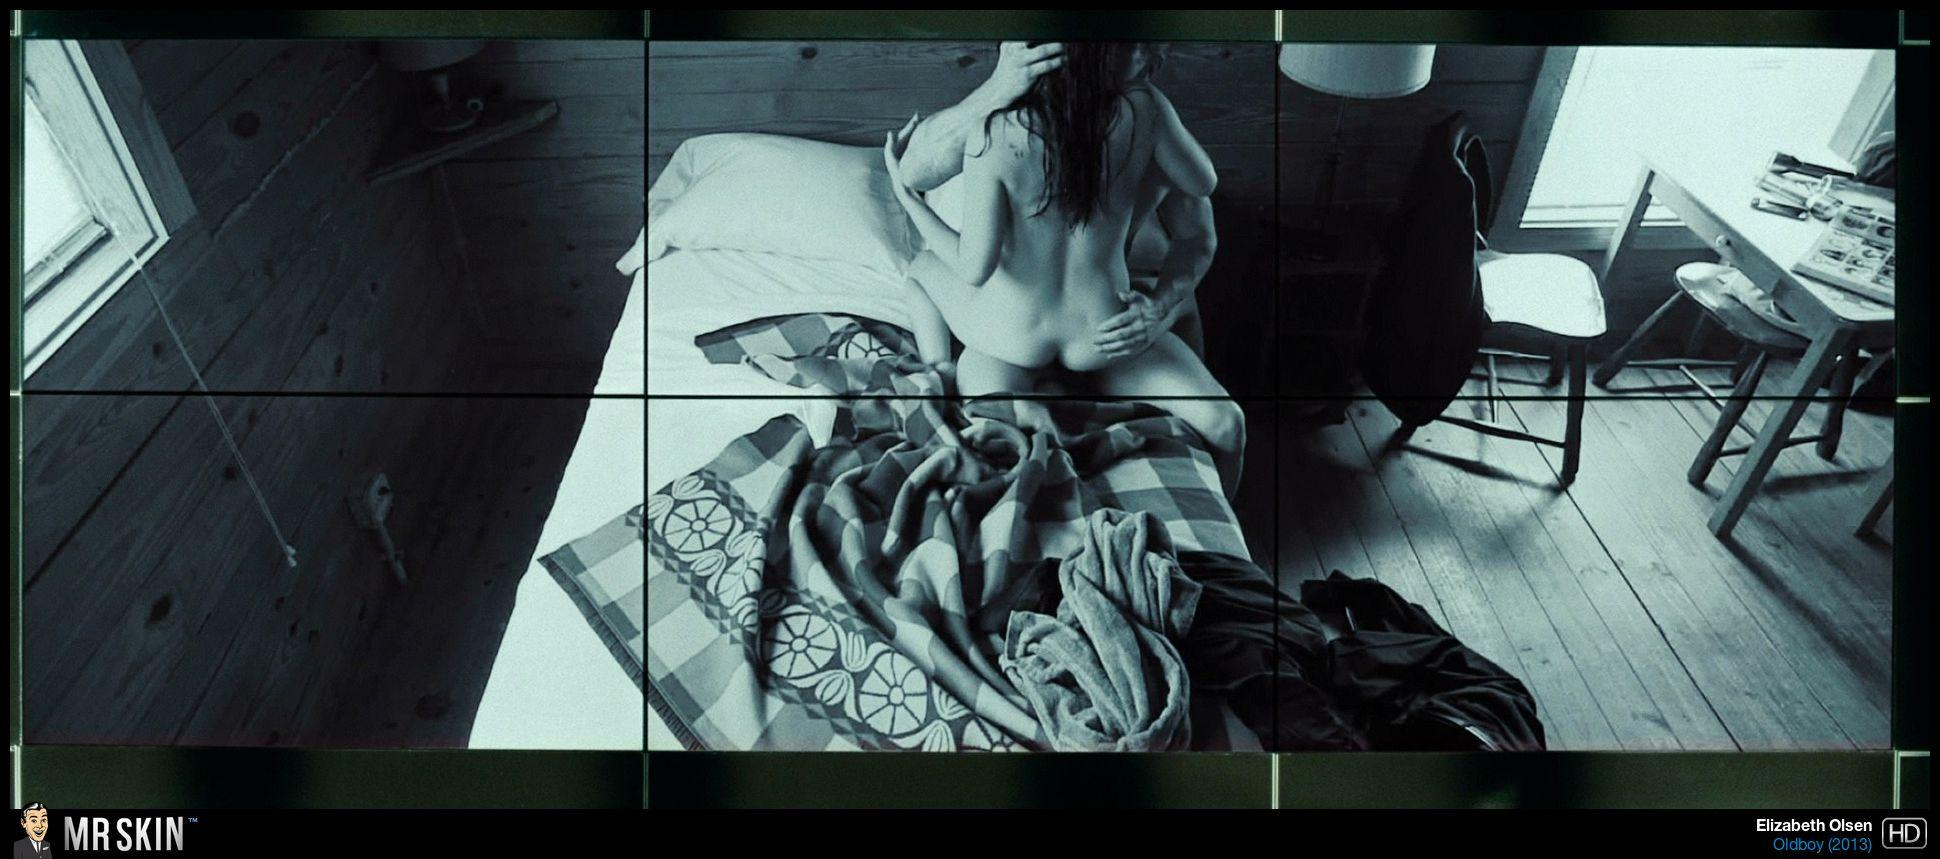 Elizabeth Olsen anal